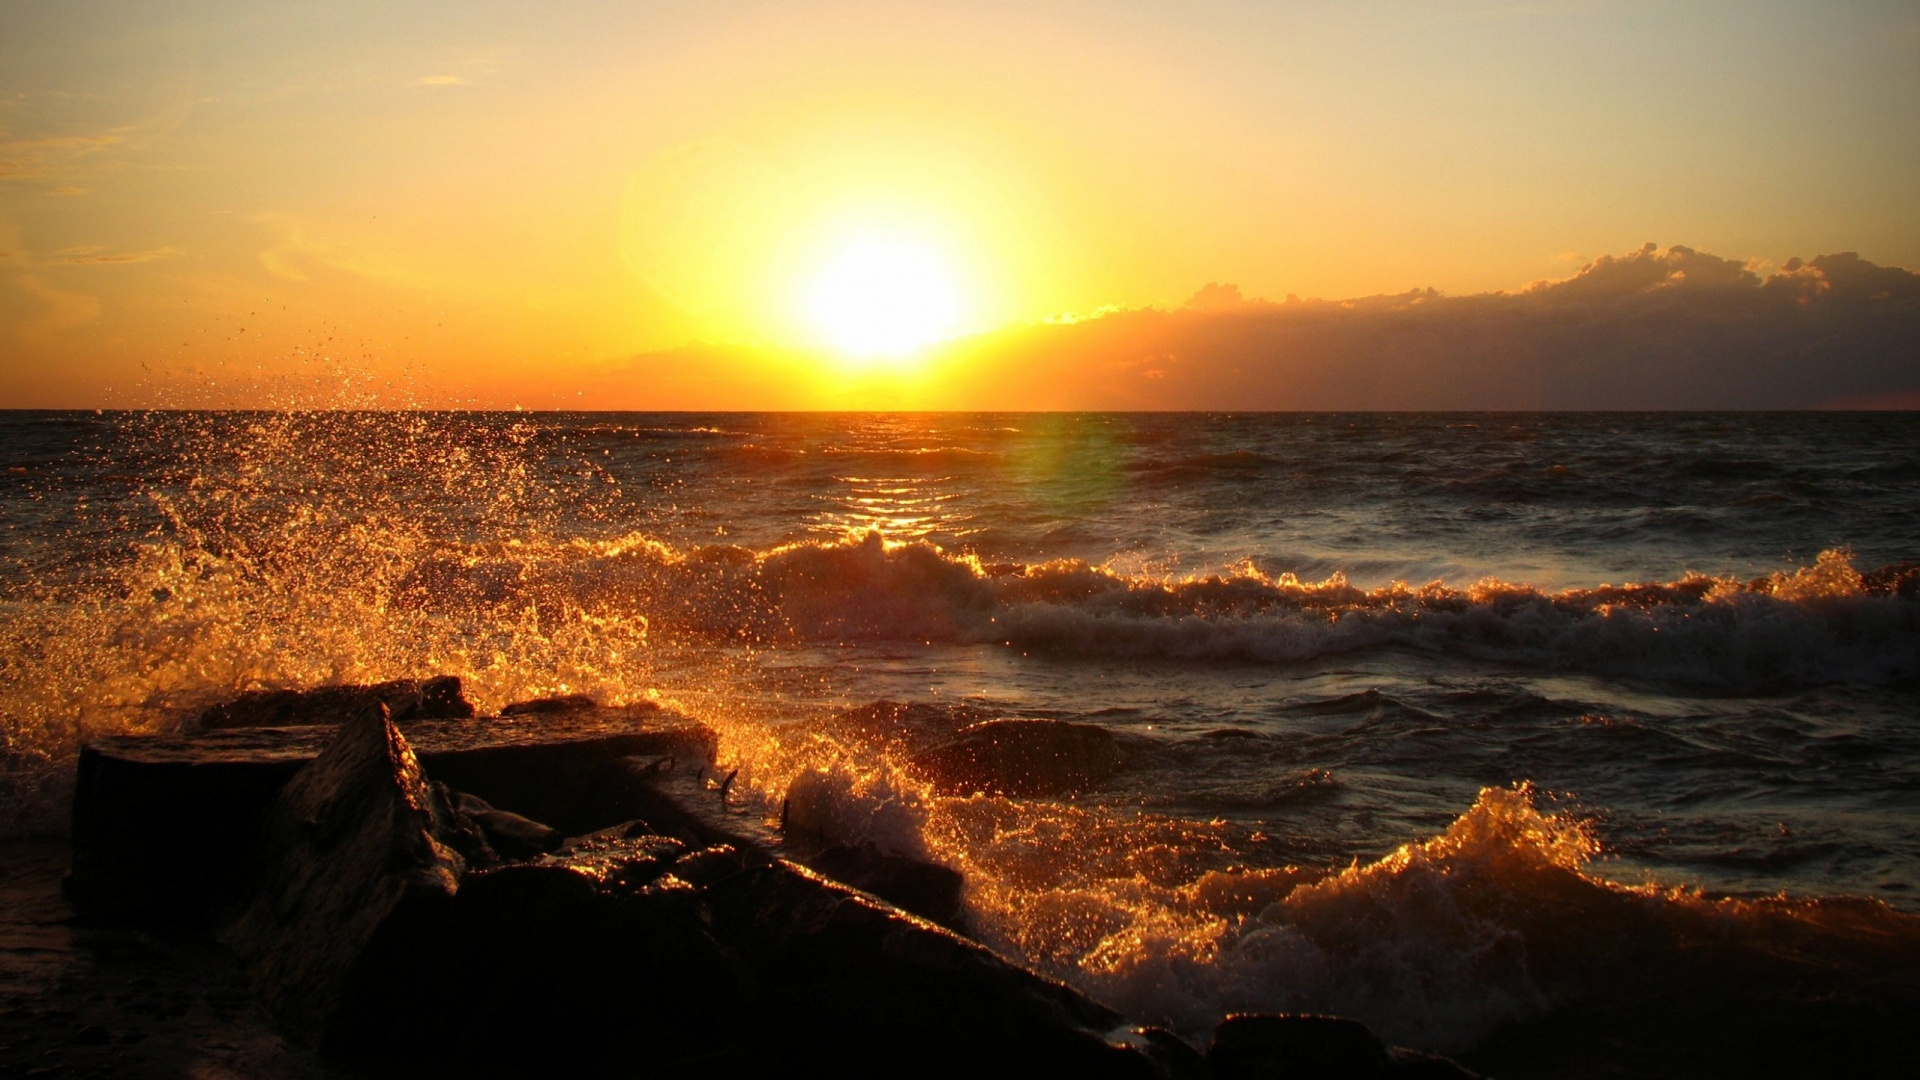 ocean sunset wallpaper 35989